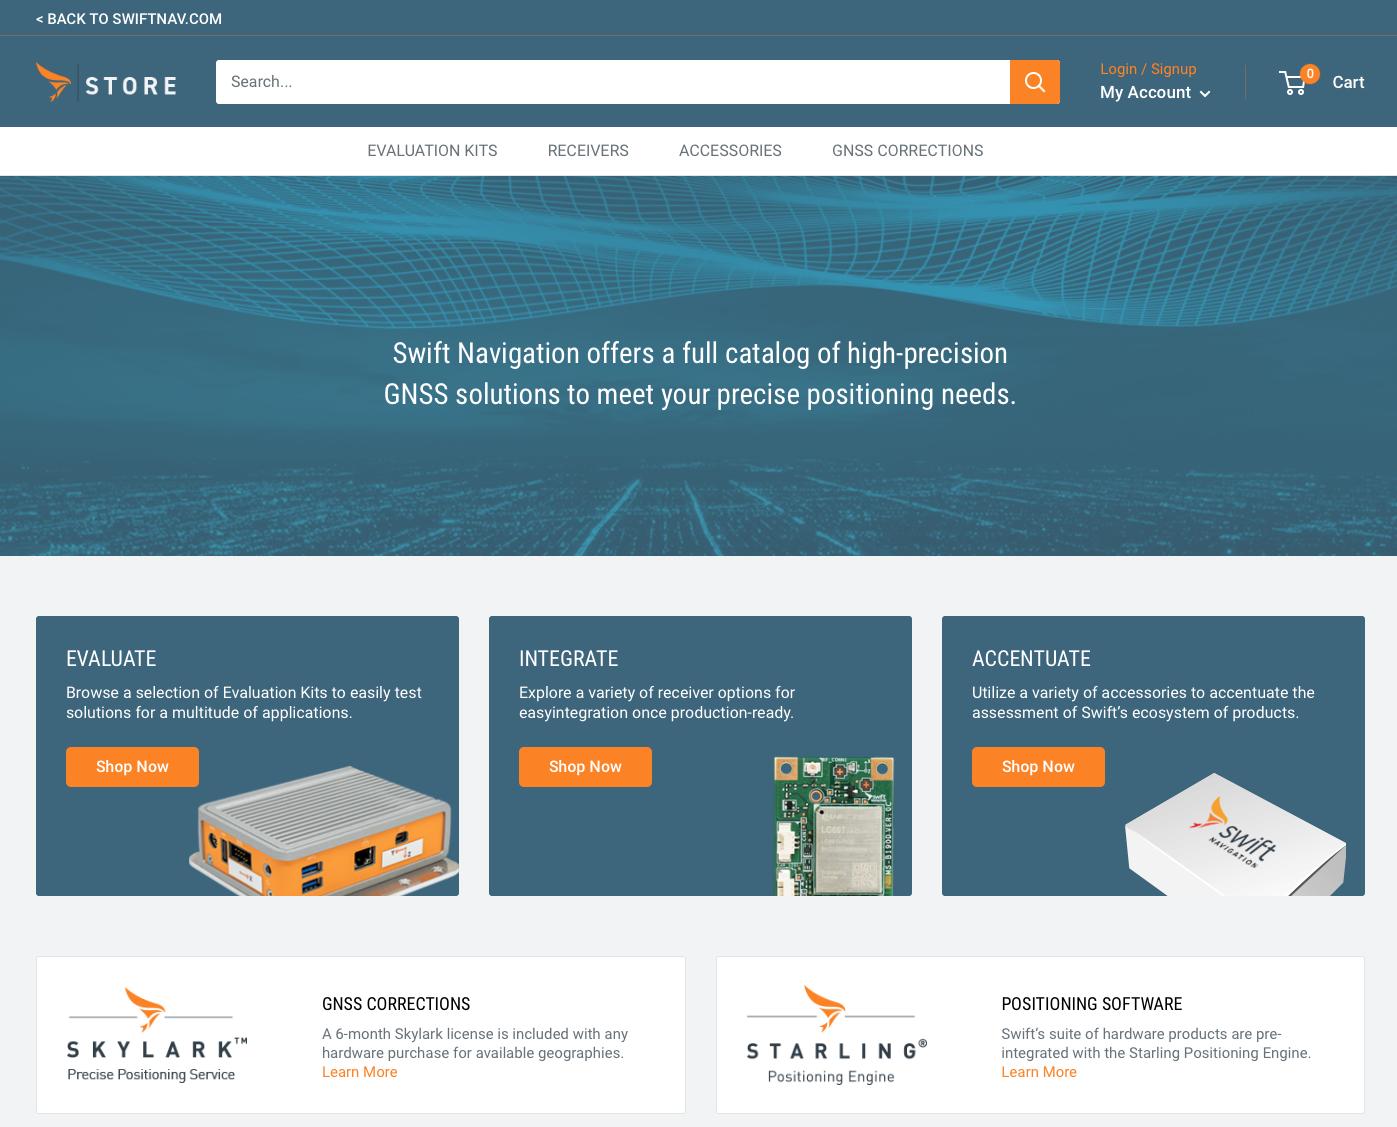 Swift Navigation eCommerce site